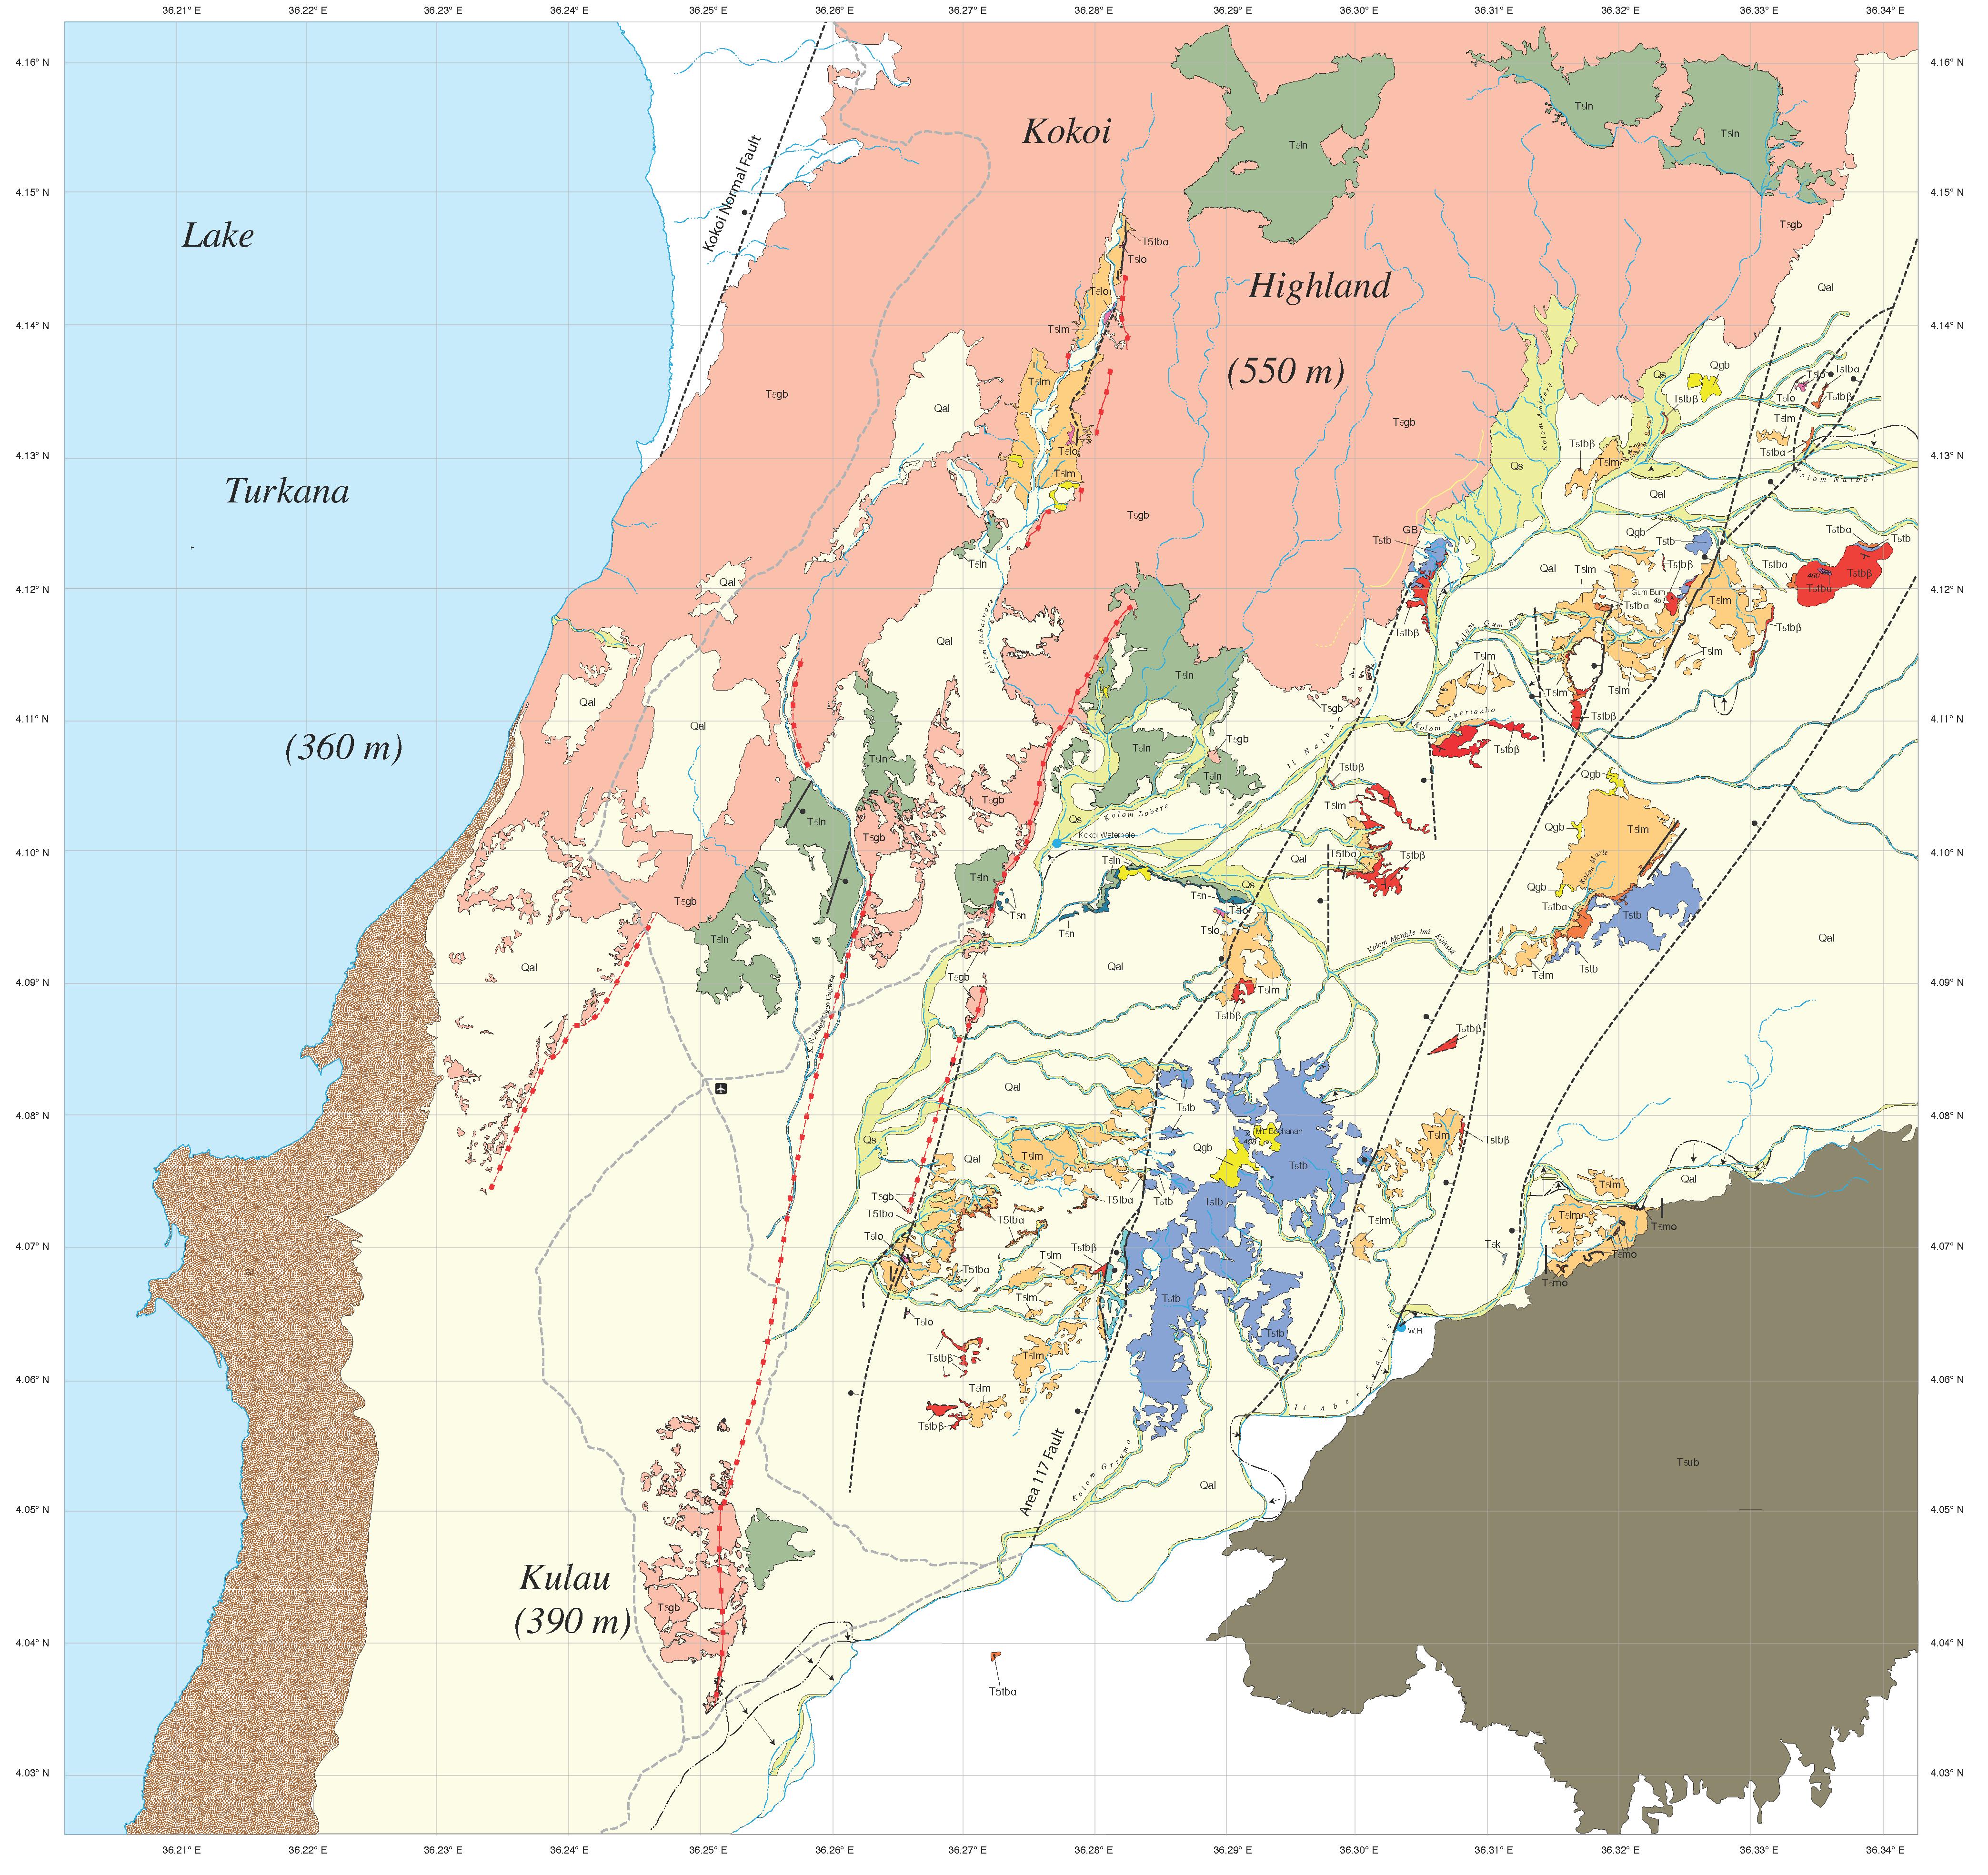 Detailed Geologic Maps